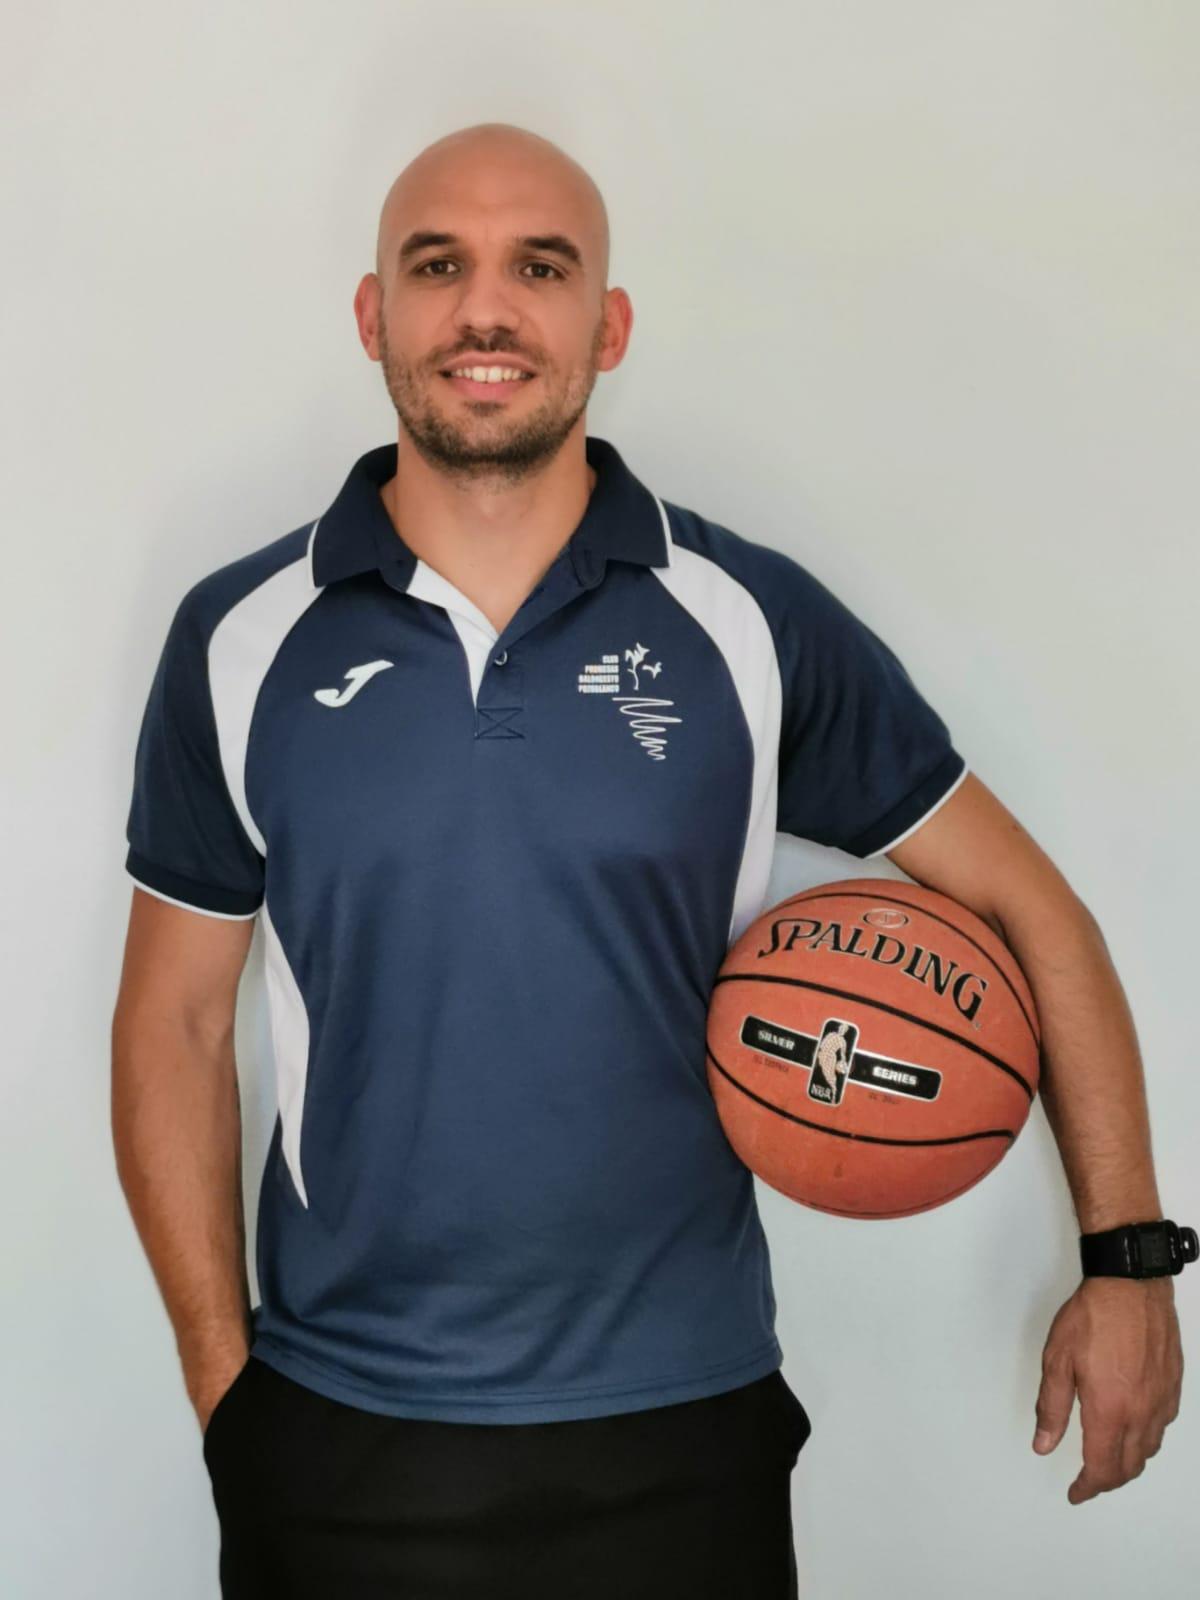 juan-pedro-cejudo-entrenador-equipo-senior-baloncesto-promesas-pozoblanco